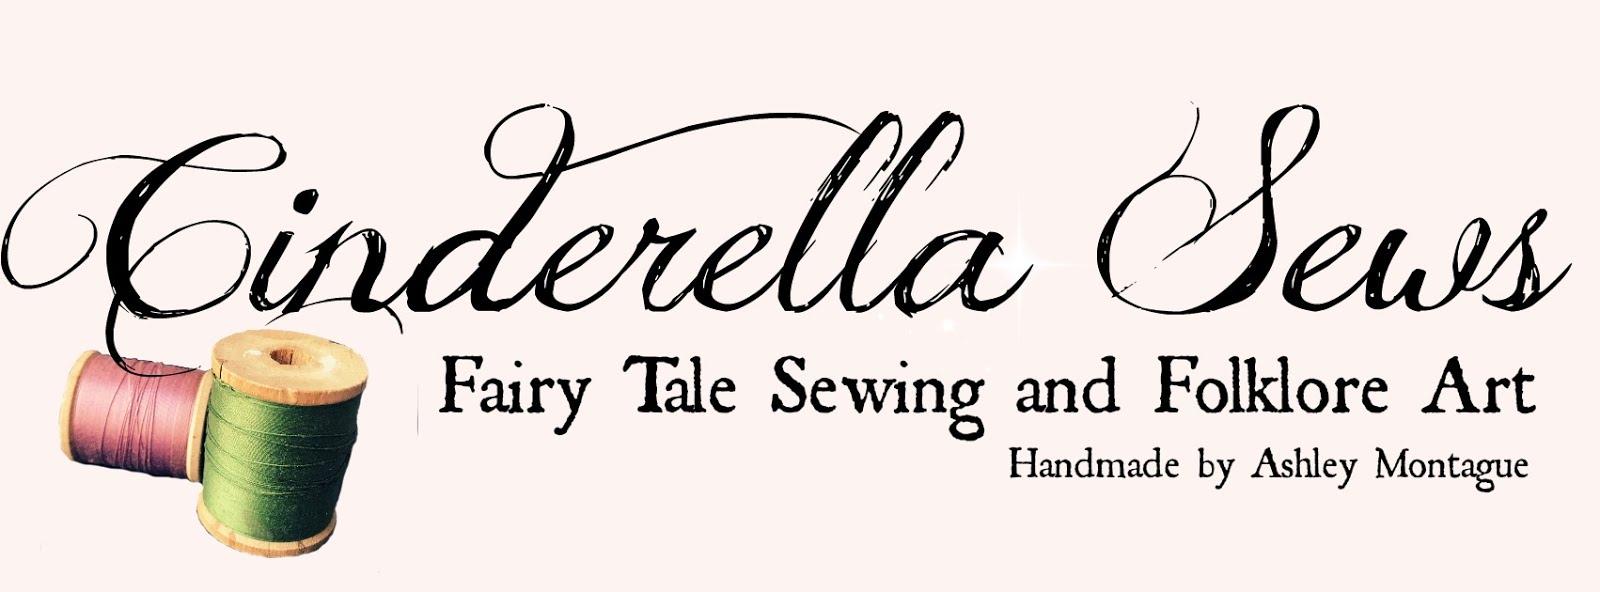 Cinderella Sews